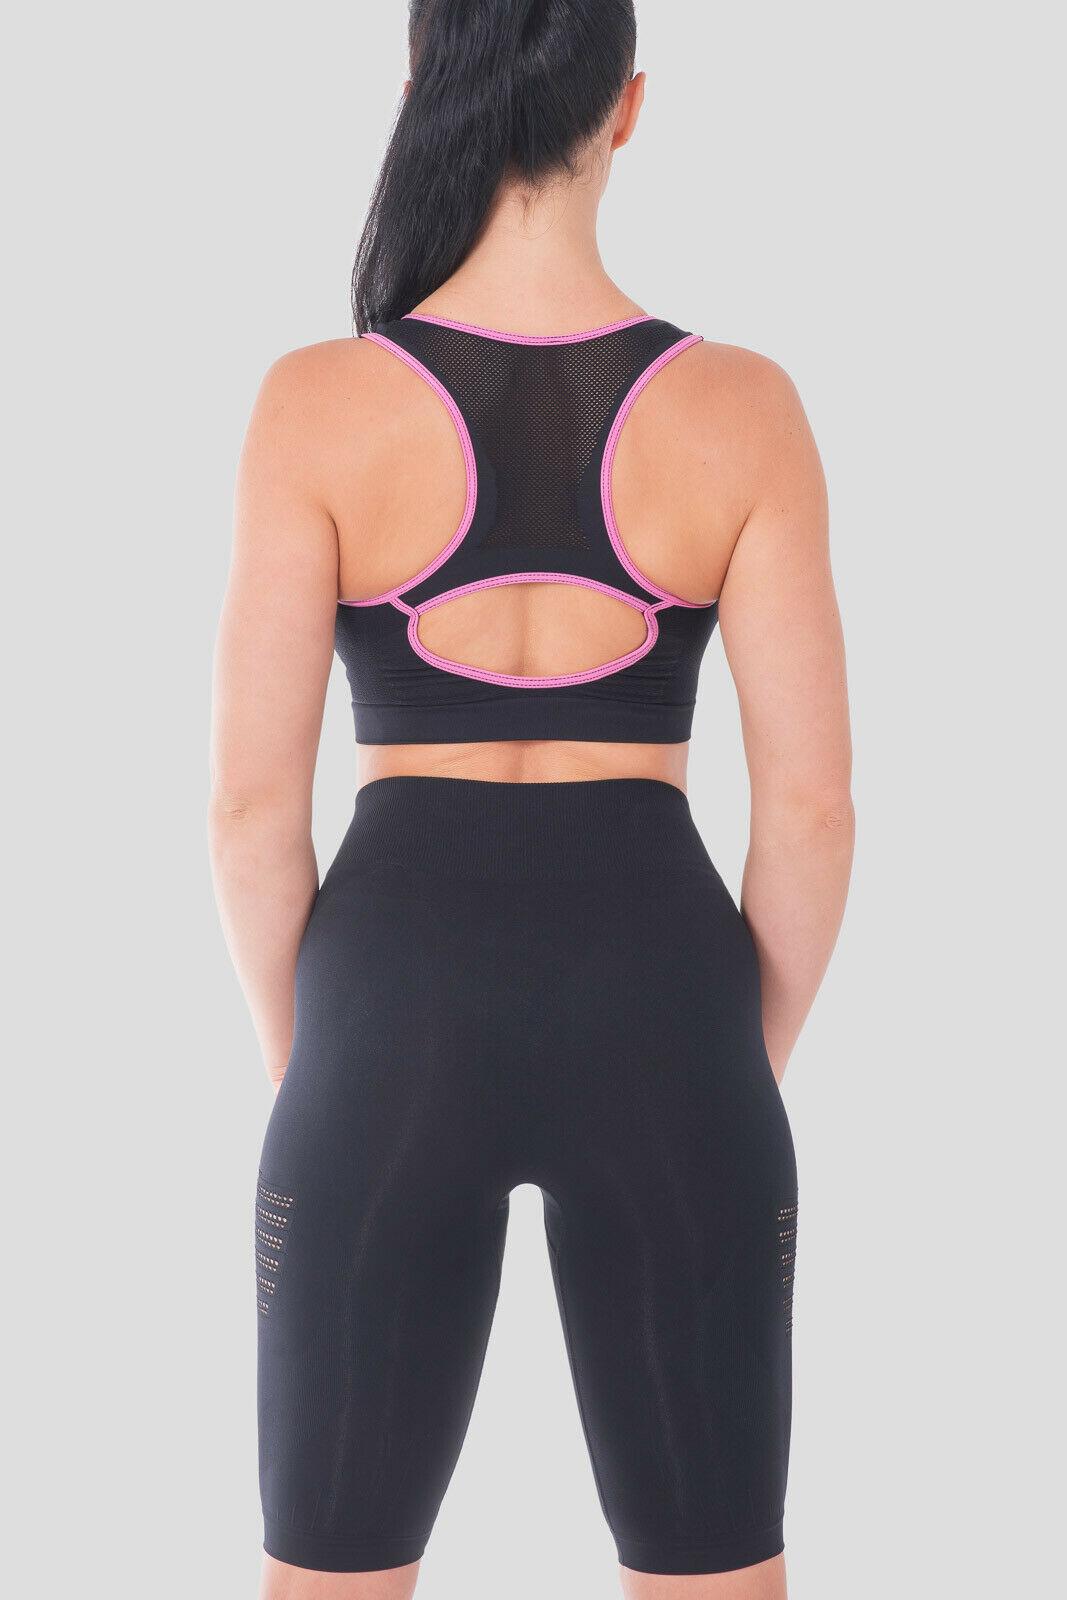 Bellissima-Women-039-s-Sport-Bra-Running-Yoga-Workout-Fitness-Racerback-Seamless thumbnail 33